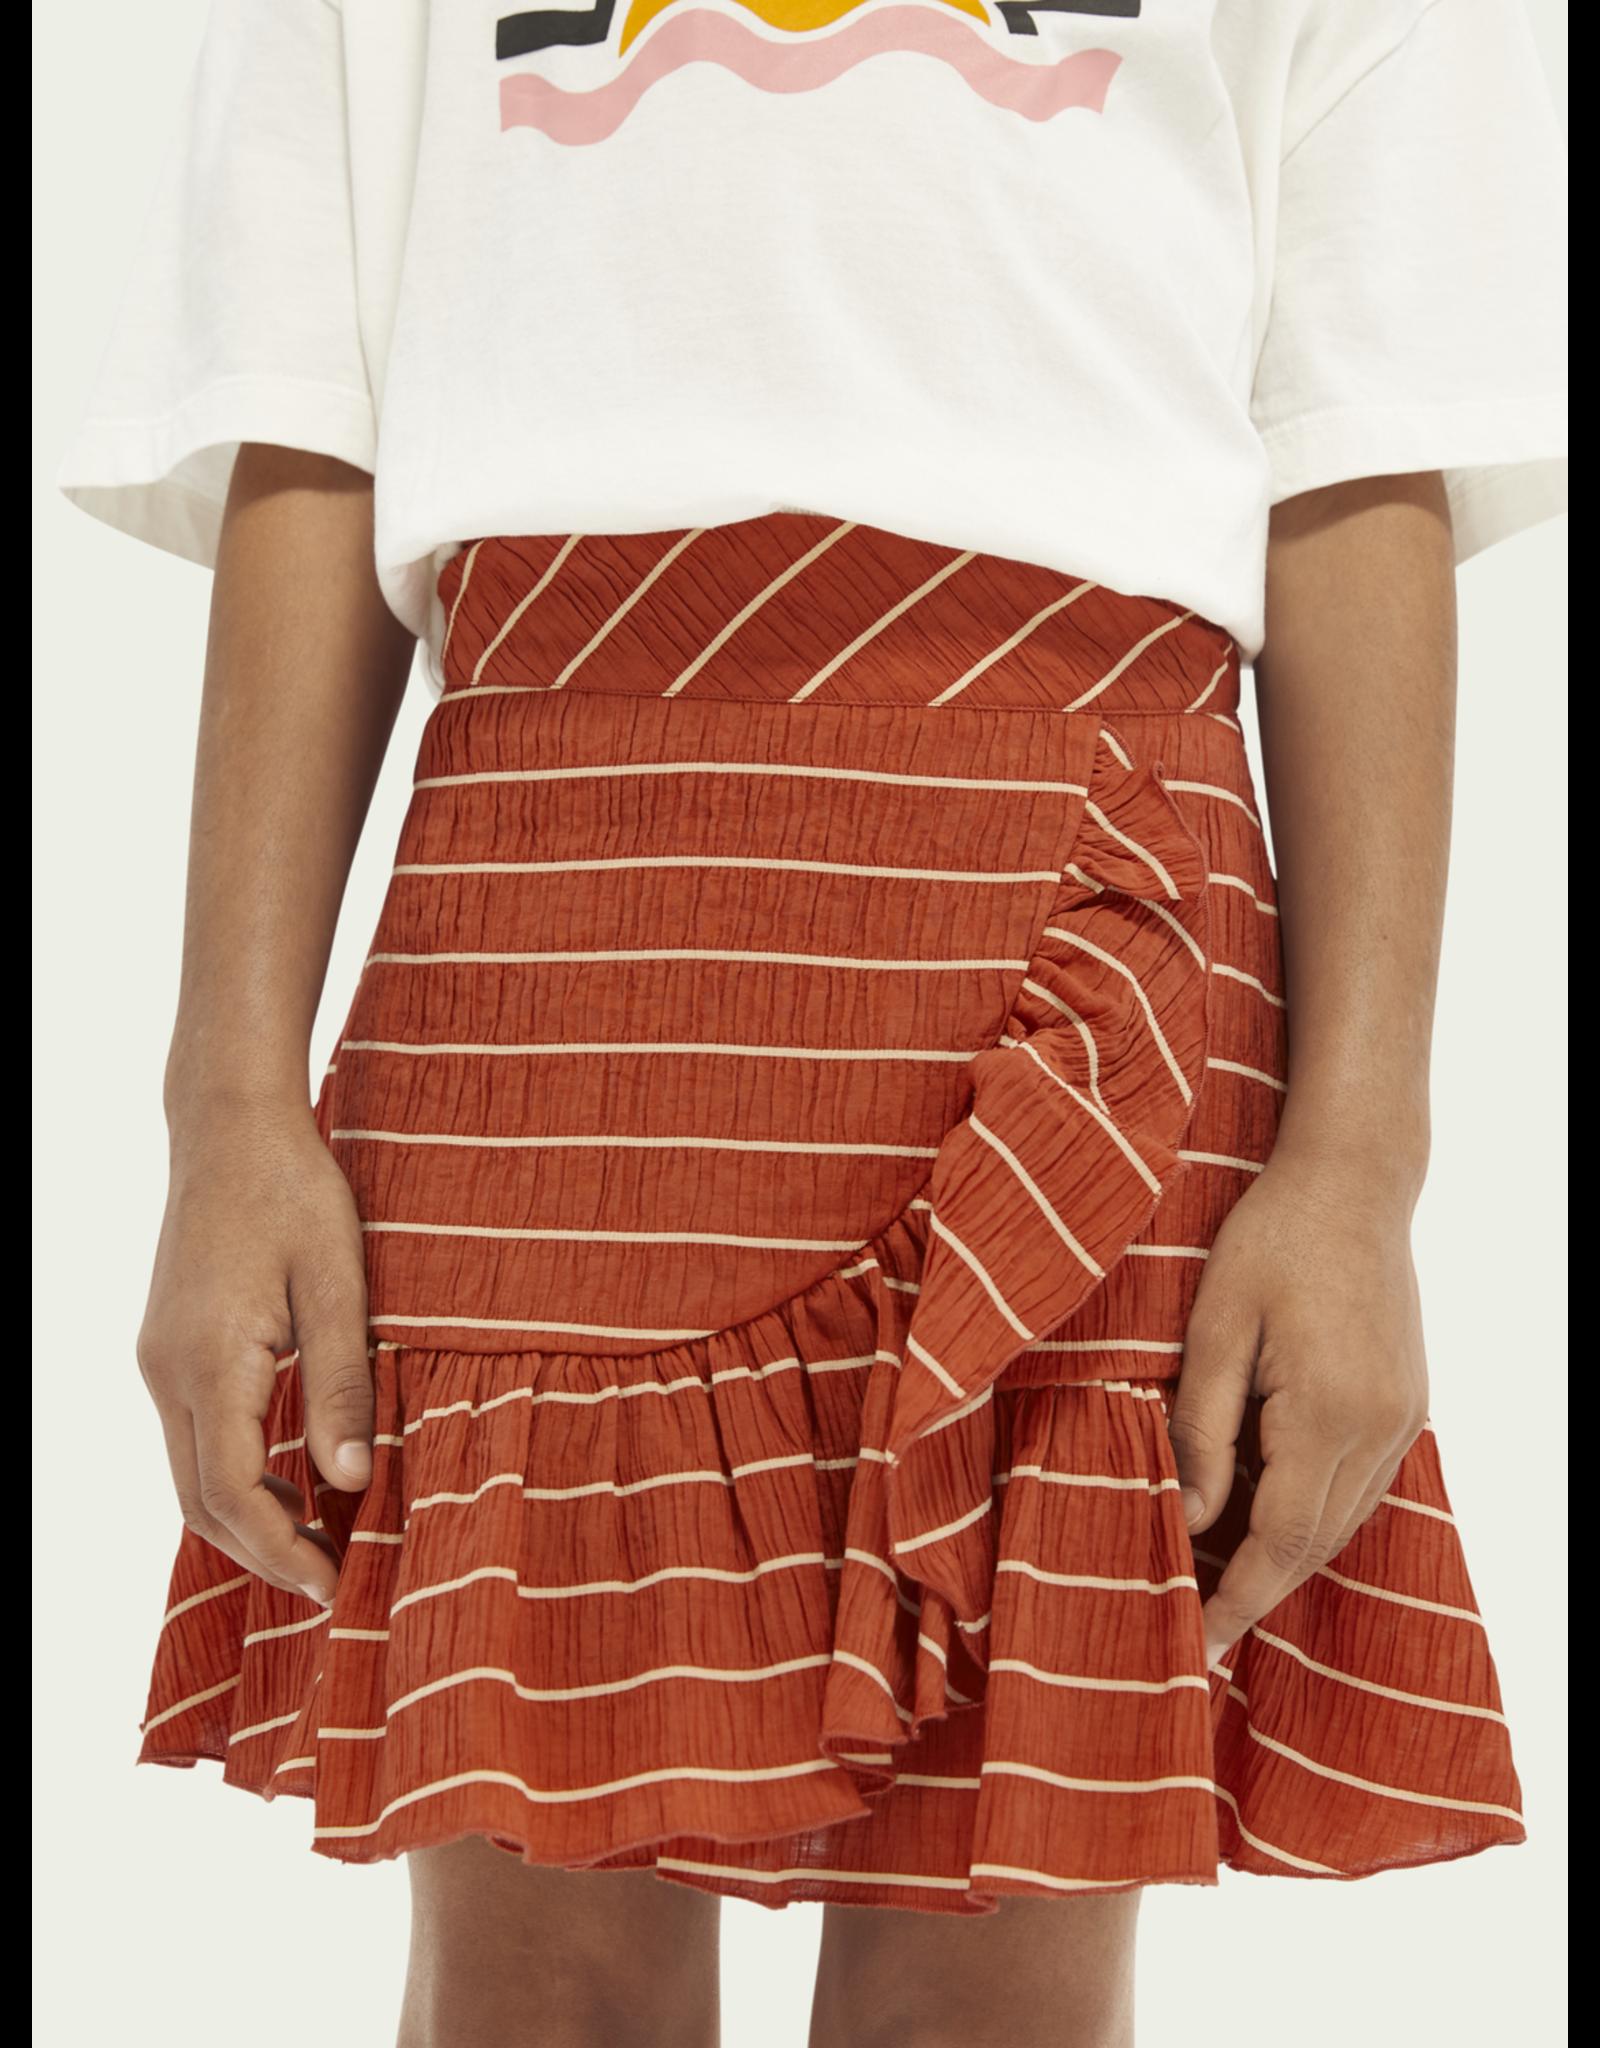 Scotch&Soda Scotch&Soda PF21 161381 wrap over ruffle skirt